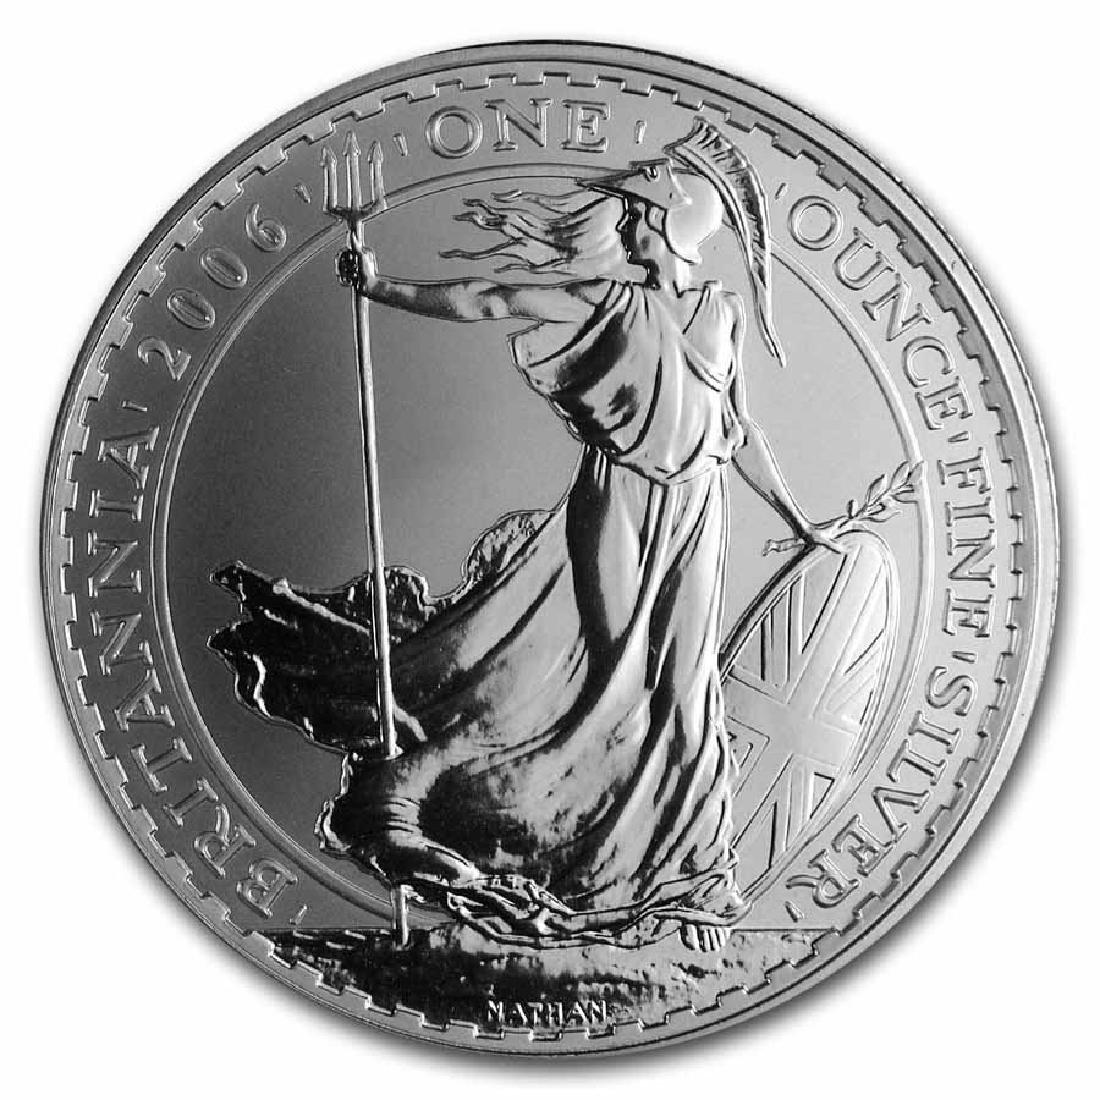 Uncirculated Silver Britannia 1 oz 2006